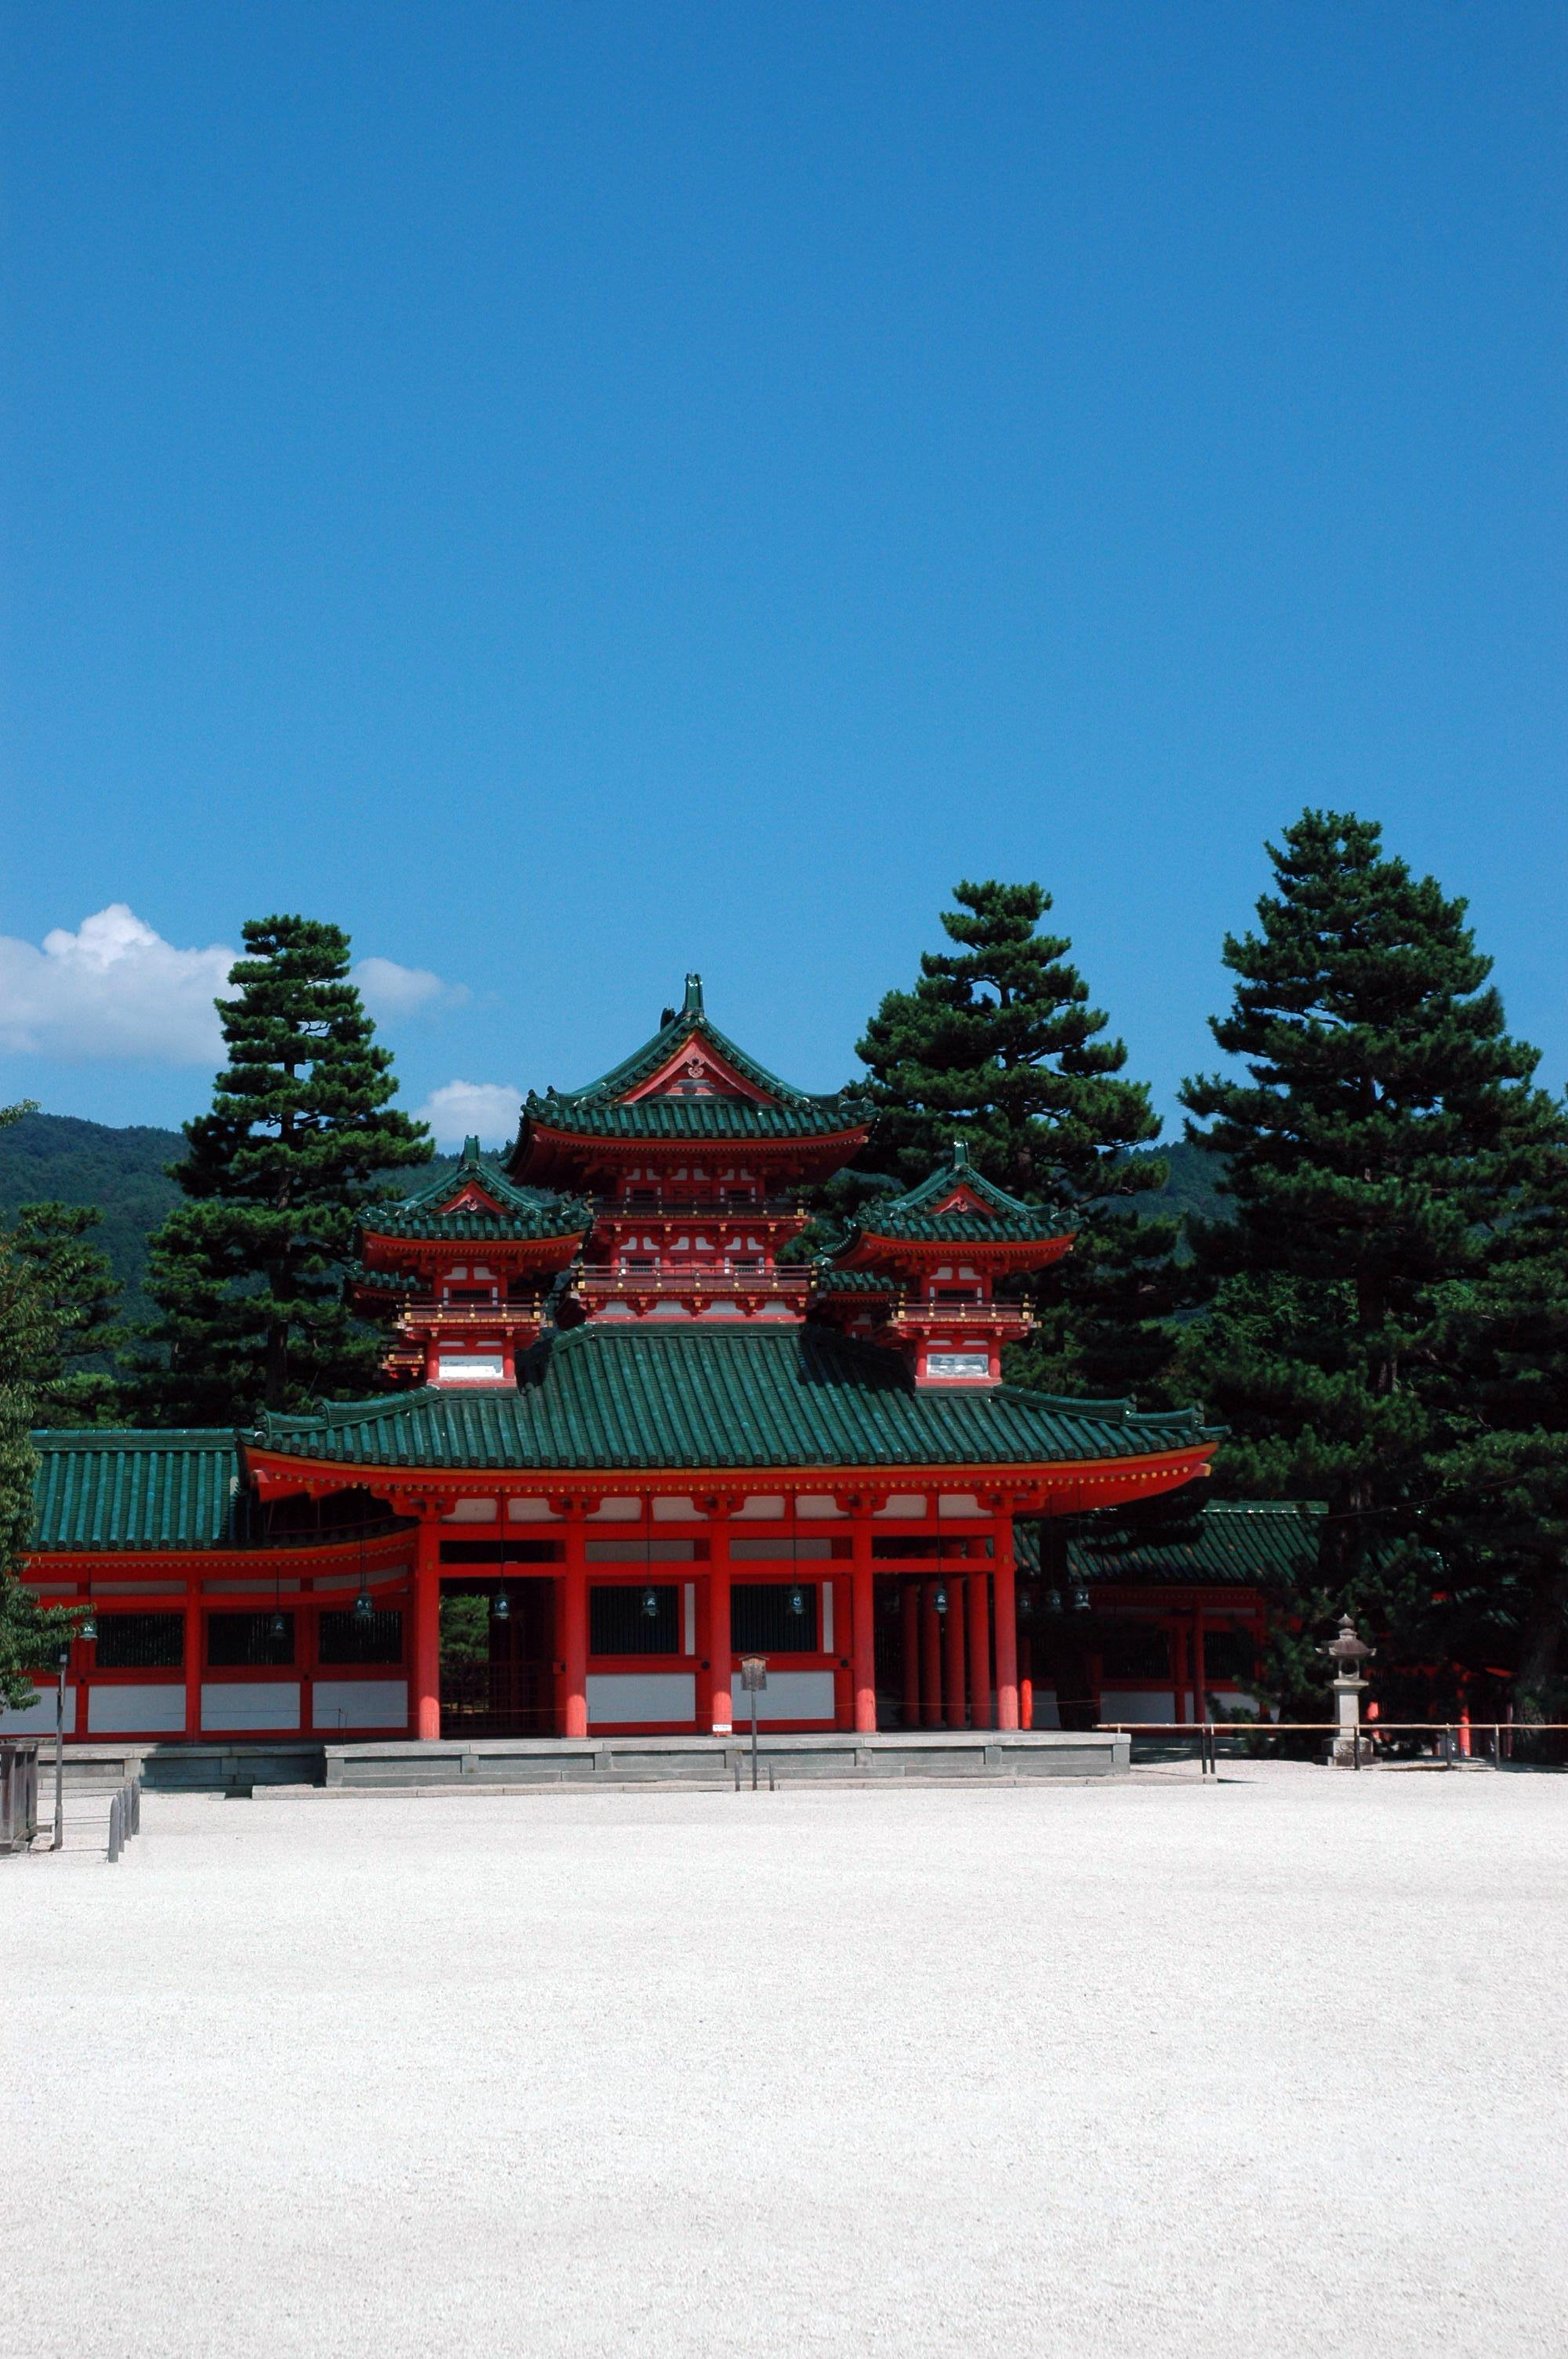 Ingresos turísticos de China llegarán a un billón de dólares en 2020